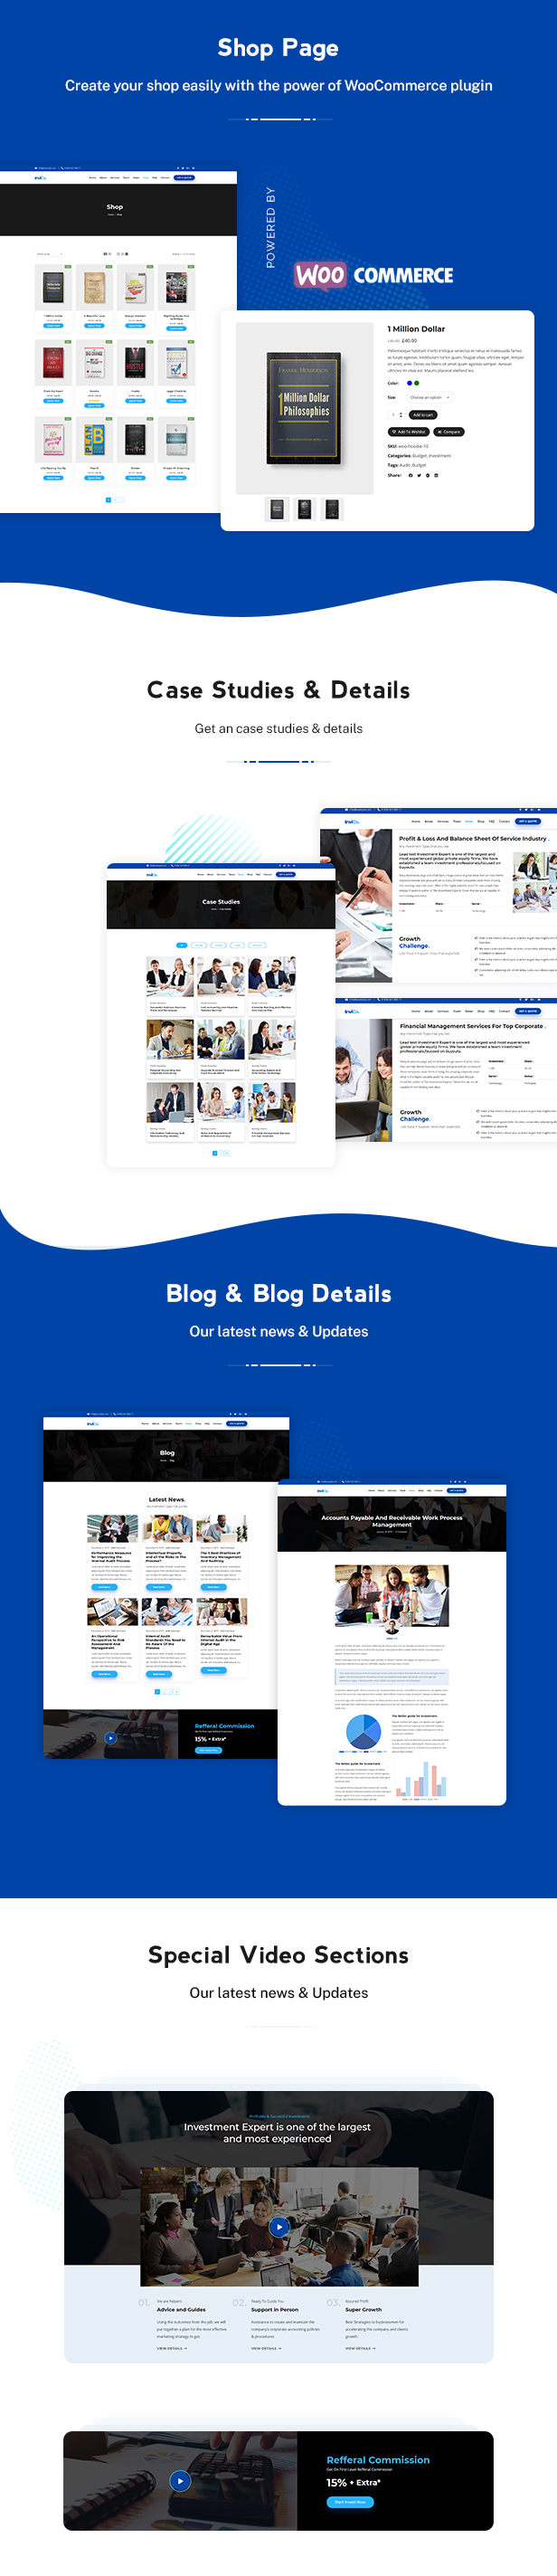 Invico - Business Consulting - 2